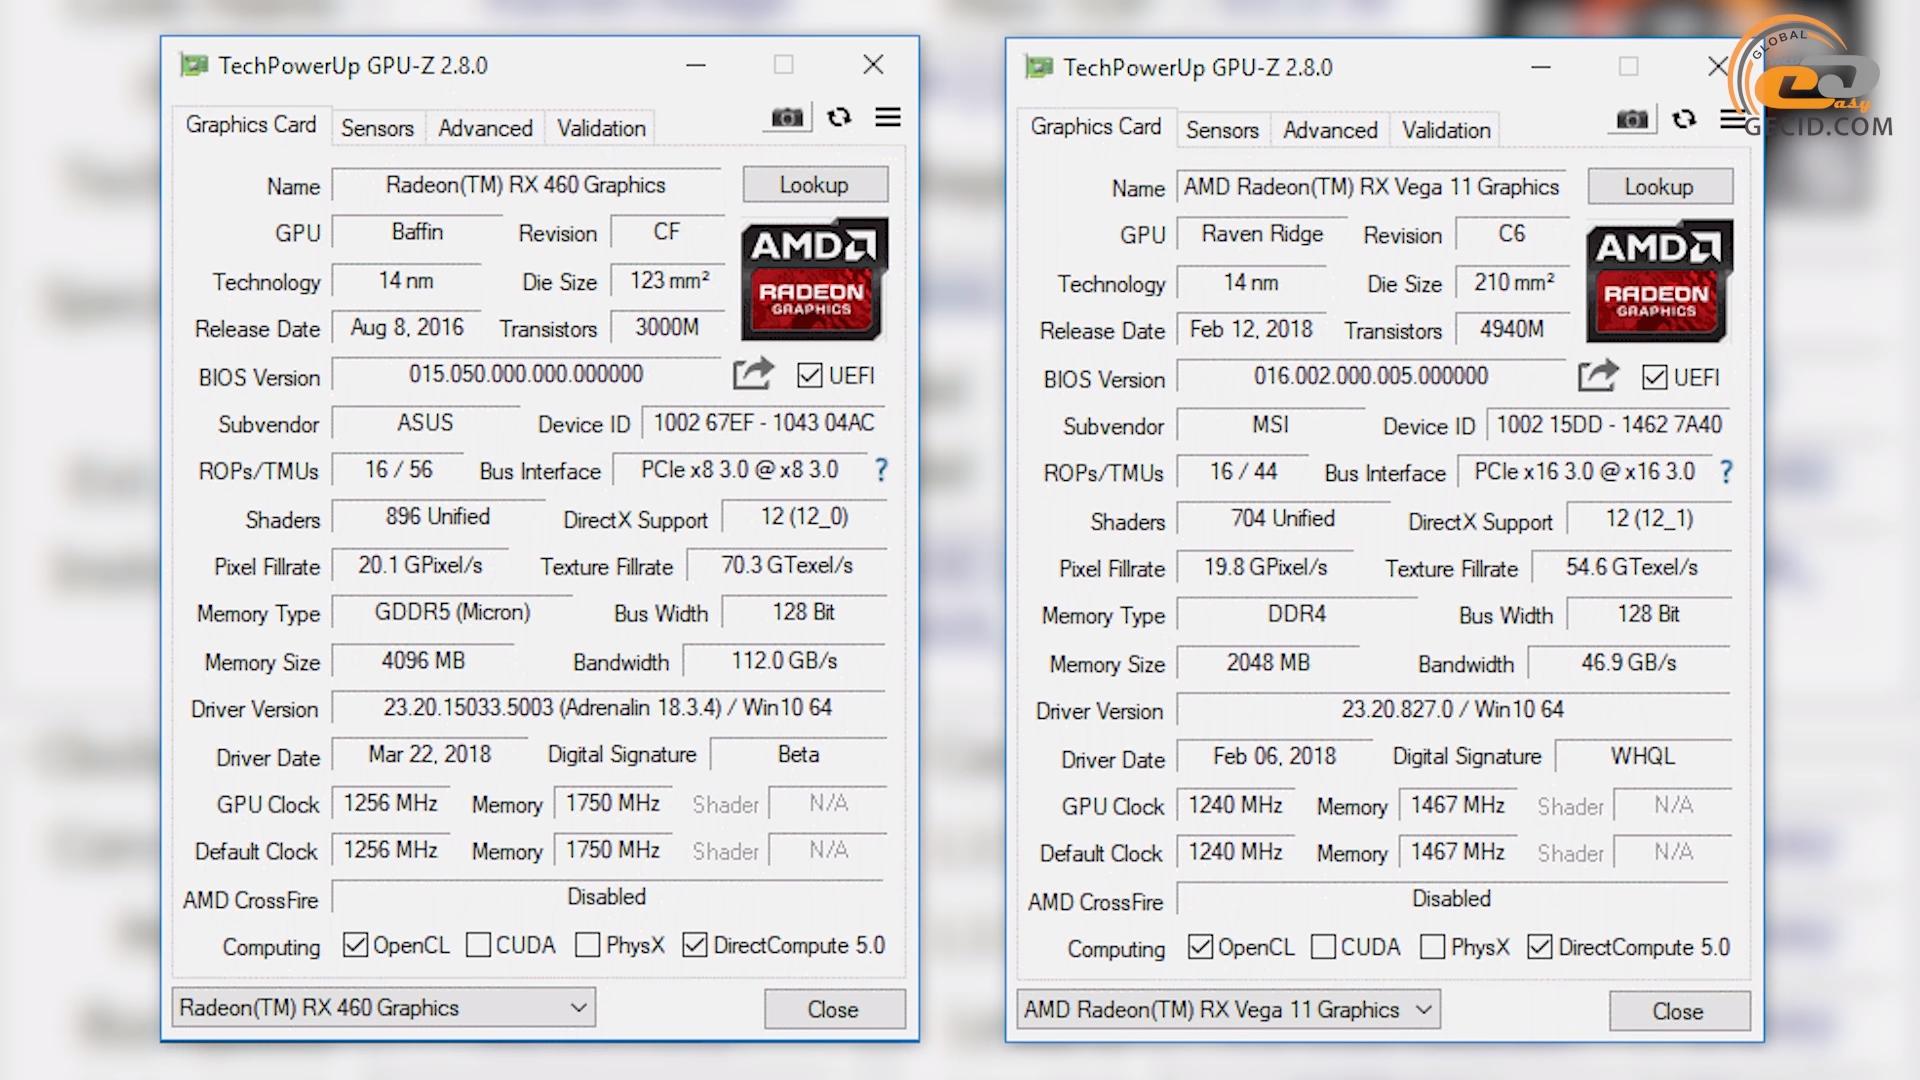 Sravnenie Radeon Vega 11 Protiv Geforce Gt 1030 Gtx 750 Ti I Radeon Rx 460 4gb Stranica 1 Gecid Com